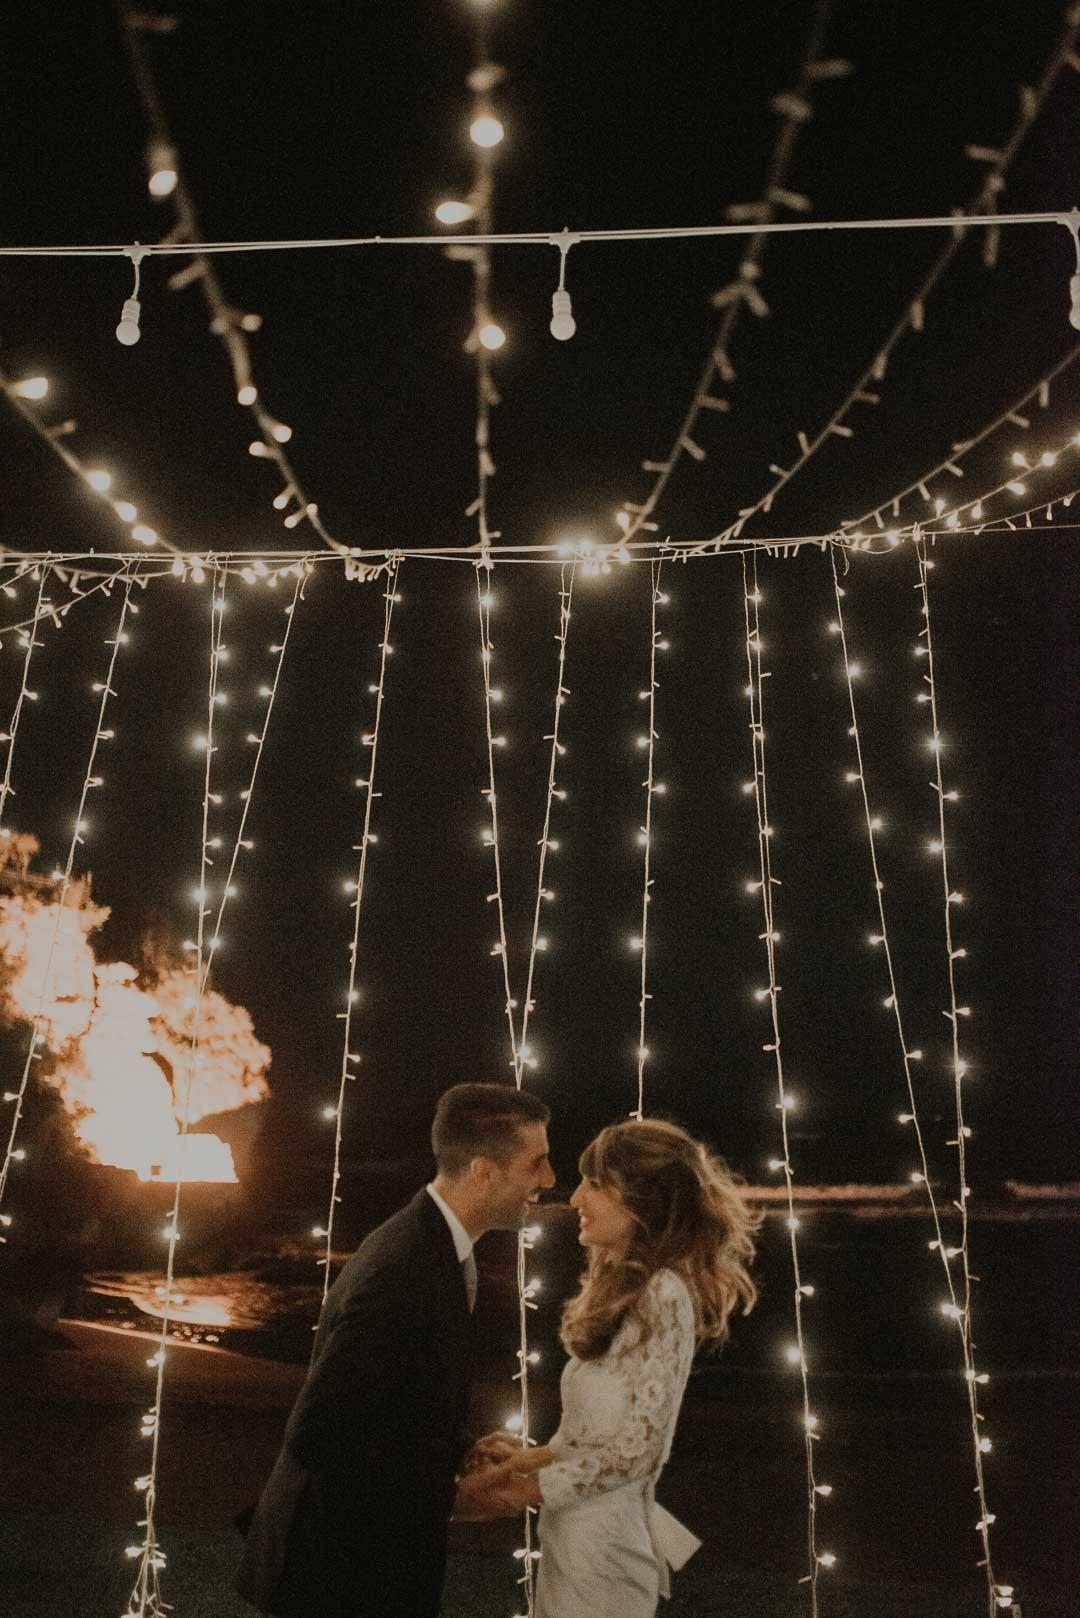 wedding-photographer-destination-fineart-bespoke-reportage-napoli-nabilah-vivianeizzo-spazio46-187